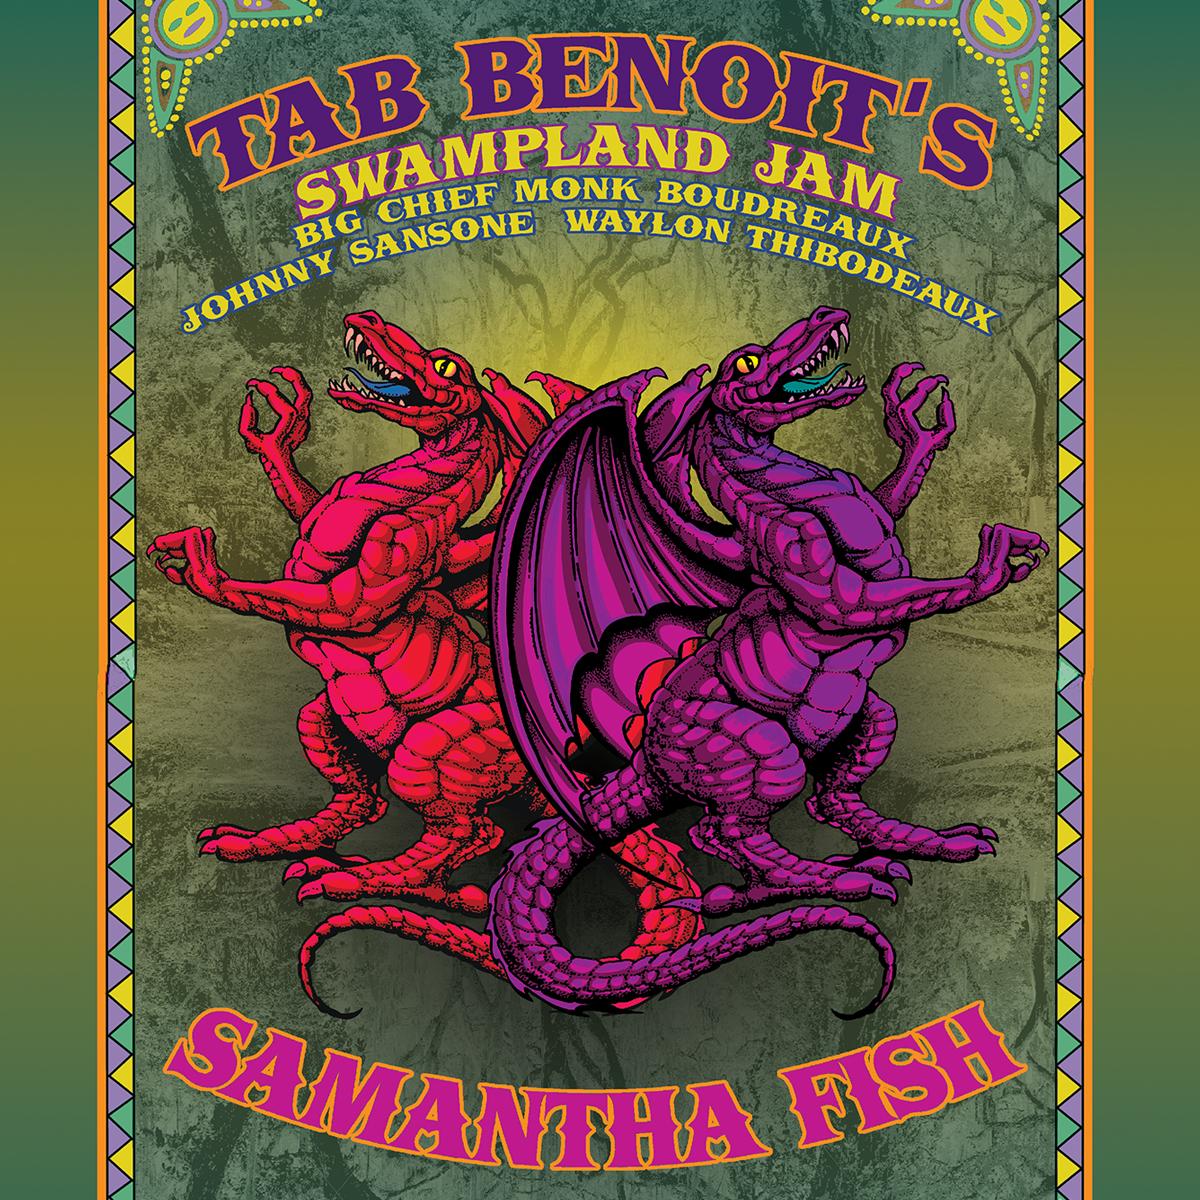 TAB BENOIT'S SWAMPLAND JAM + SAMANTHA FISH BAND